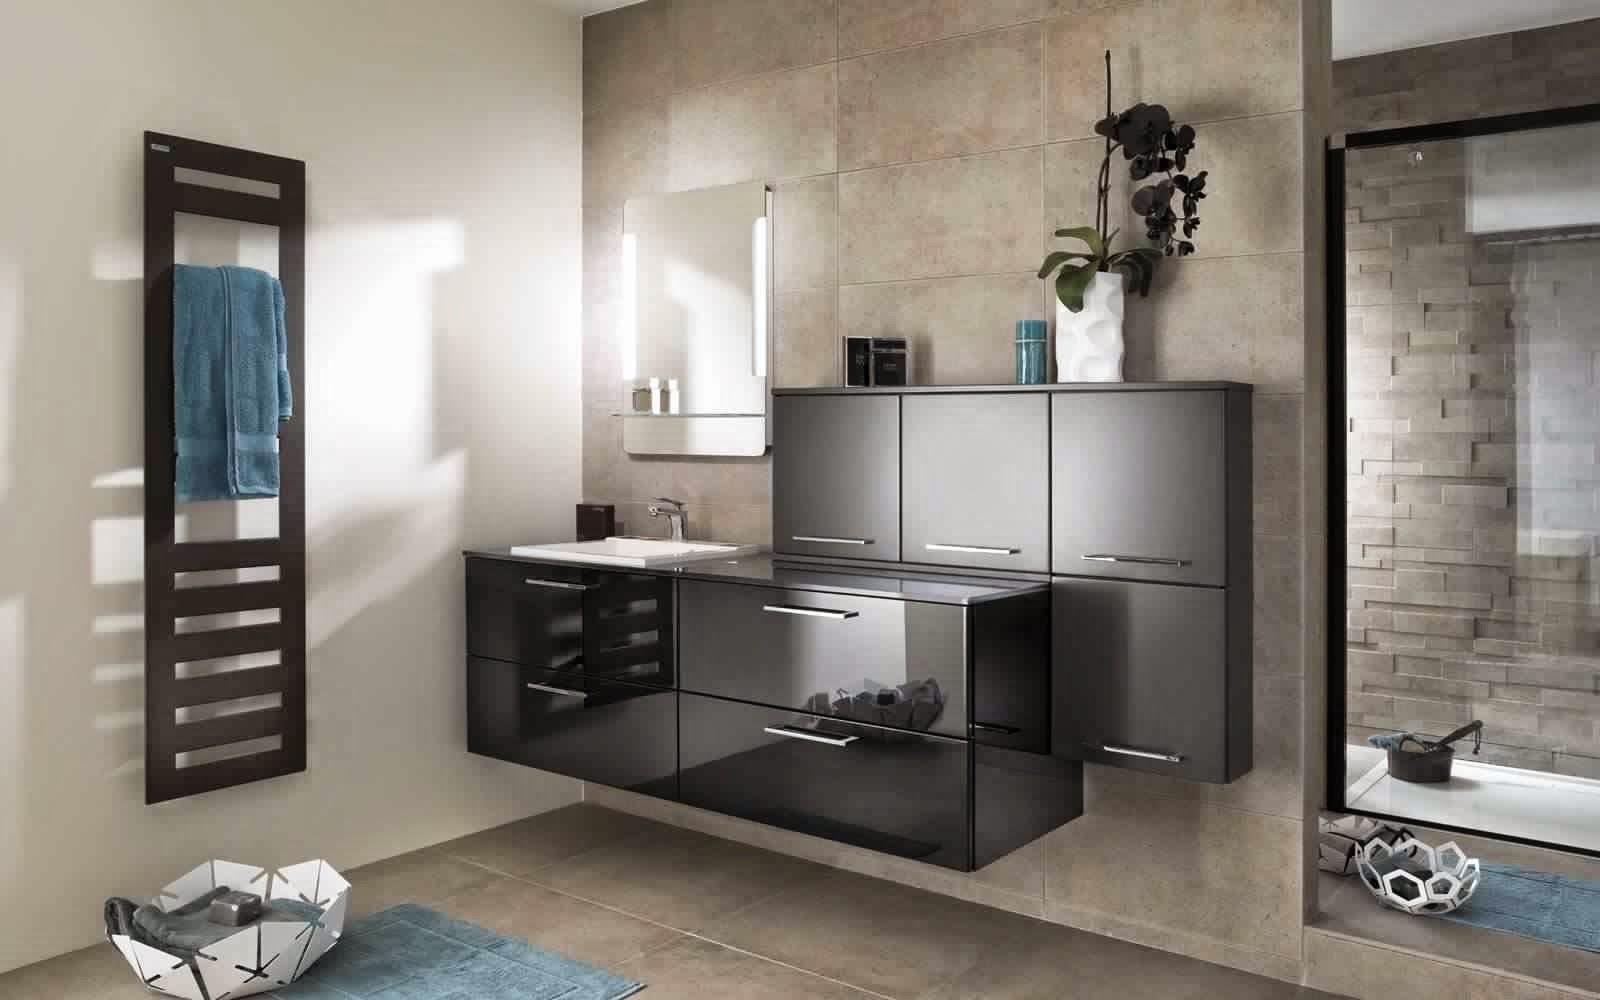 Meuble salle de bain noir meuble d coration maison for Castorama salle de bain meuble